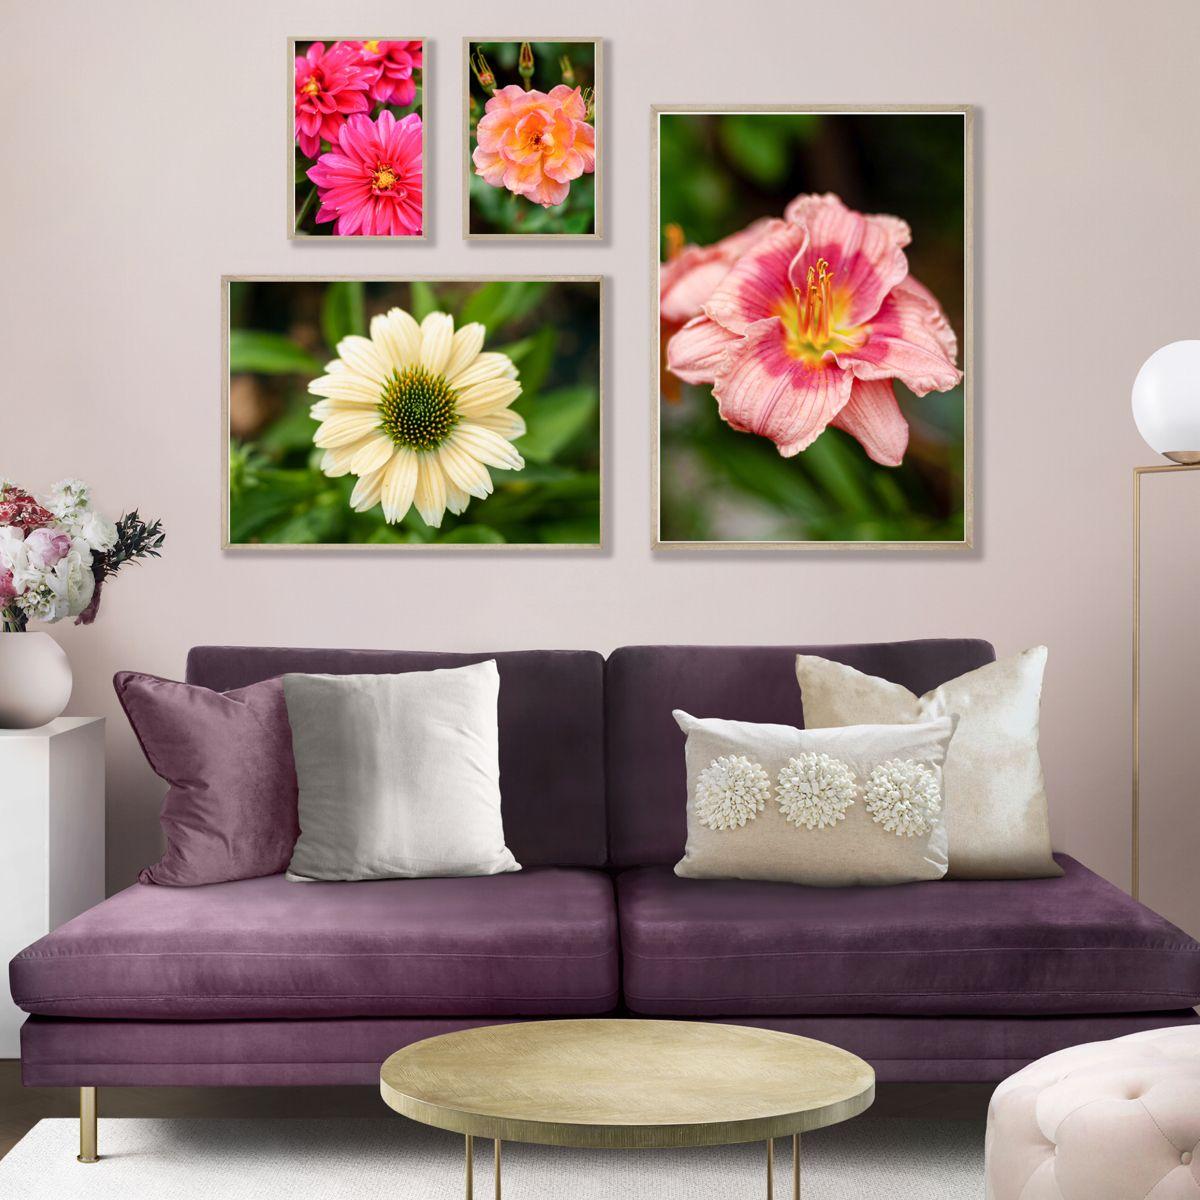 #livingroomdecor #livingroomideas #livingroomfurniture #livingroomdesigns #livingroomdecorideas #colorfulhomedecor #couch #purpledecor #pinkdecor #floraldecoration #homedecorideas #homedecorlivingroom